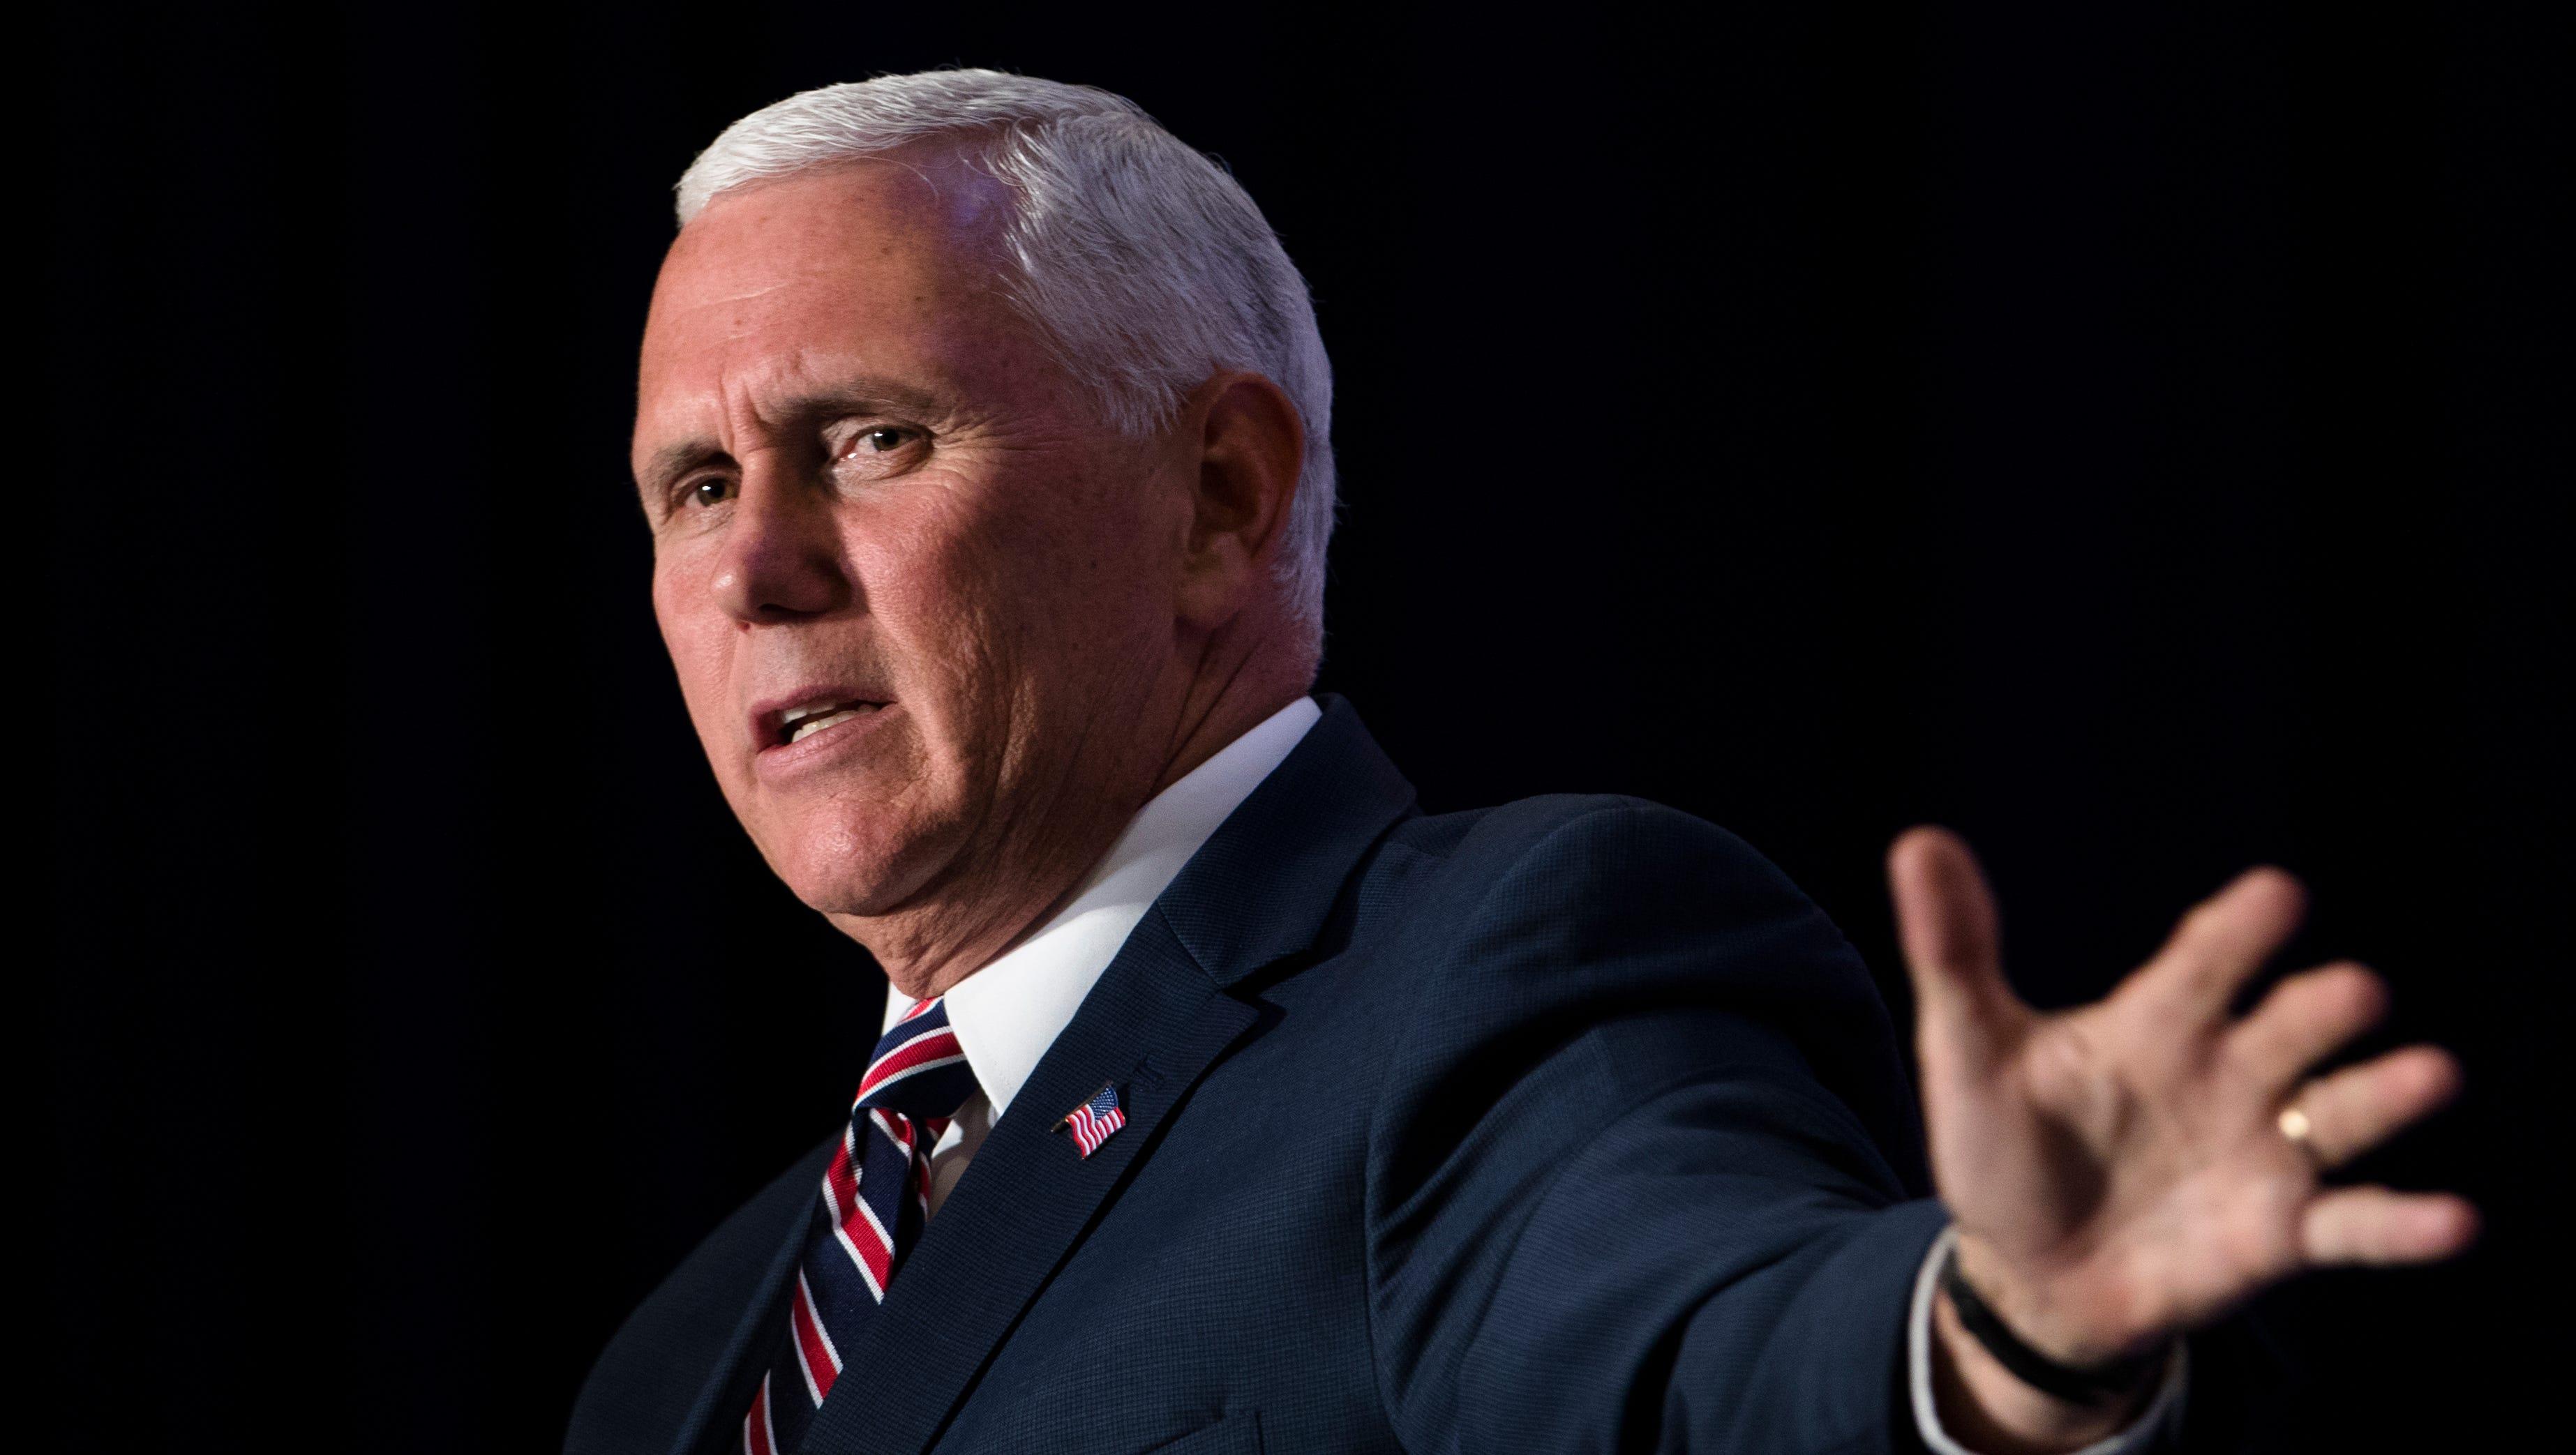 Mike Pence 'greatest vice president since John Adams,' Ohio congressman Steve Chabot says